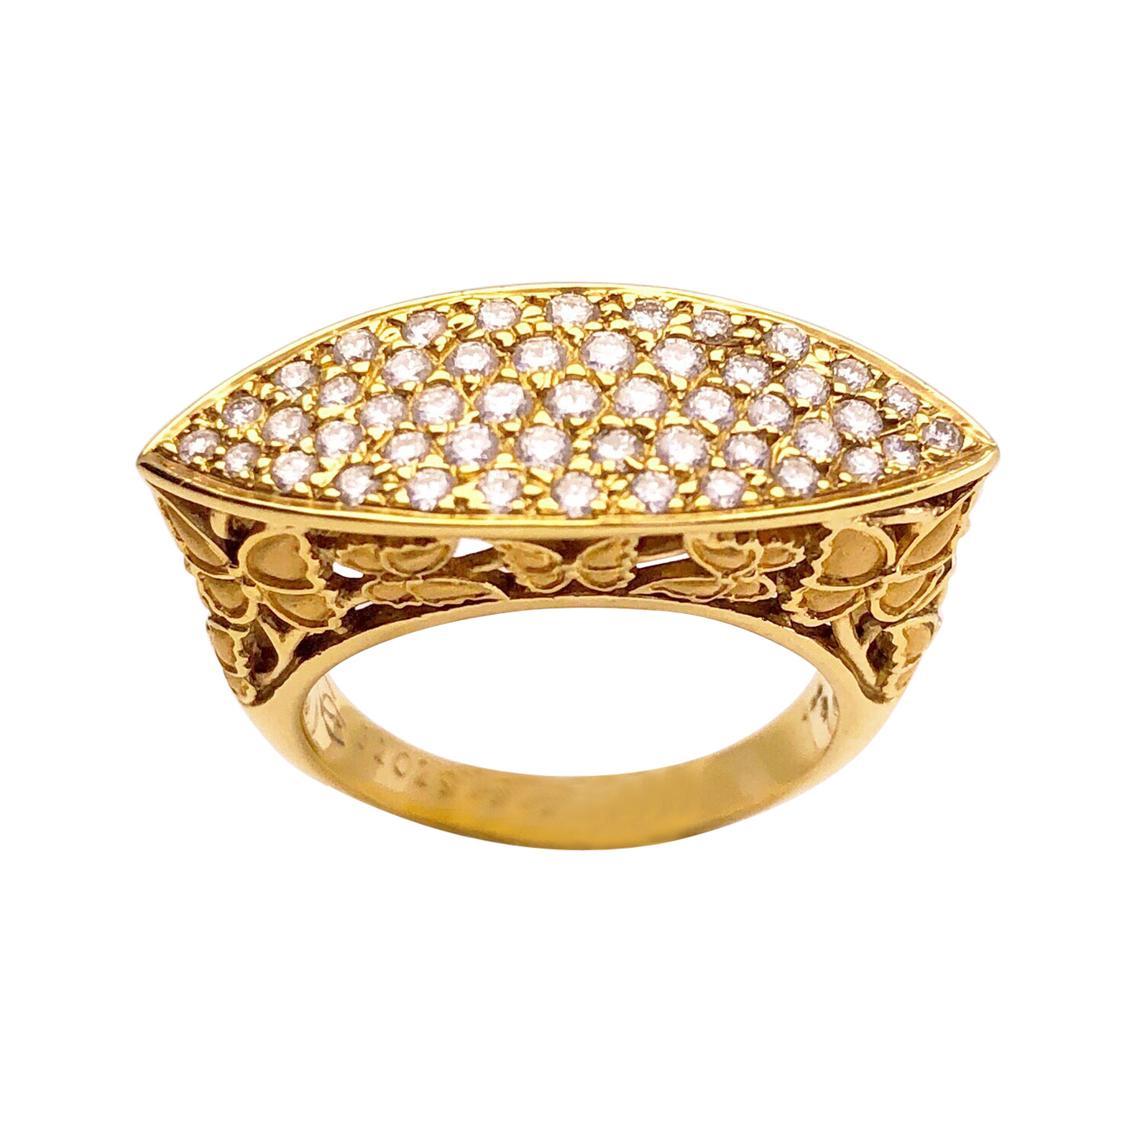 Carrera Y Carrera 18 Karat Yellow Gold and .65 Carat, Diamond Butterfly Ring